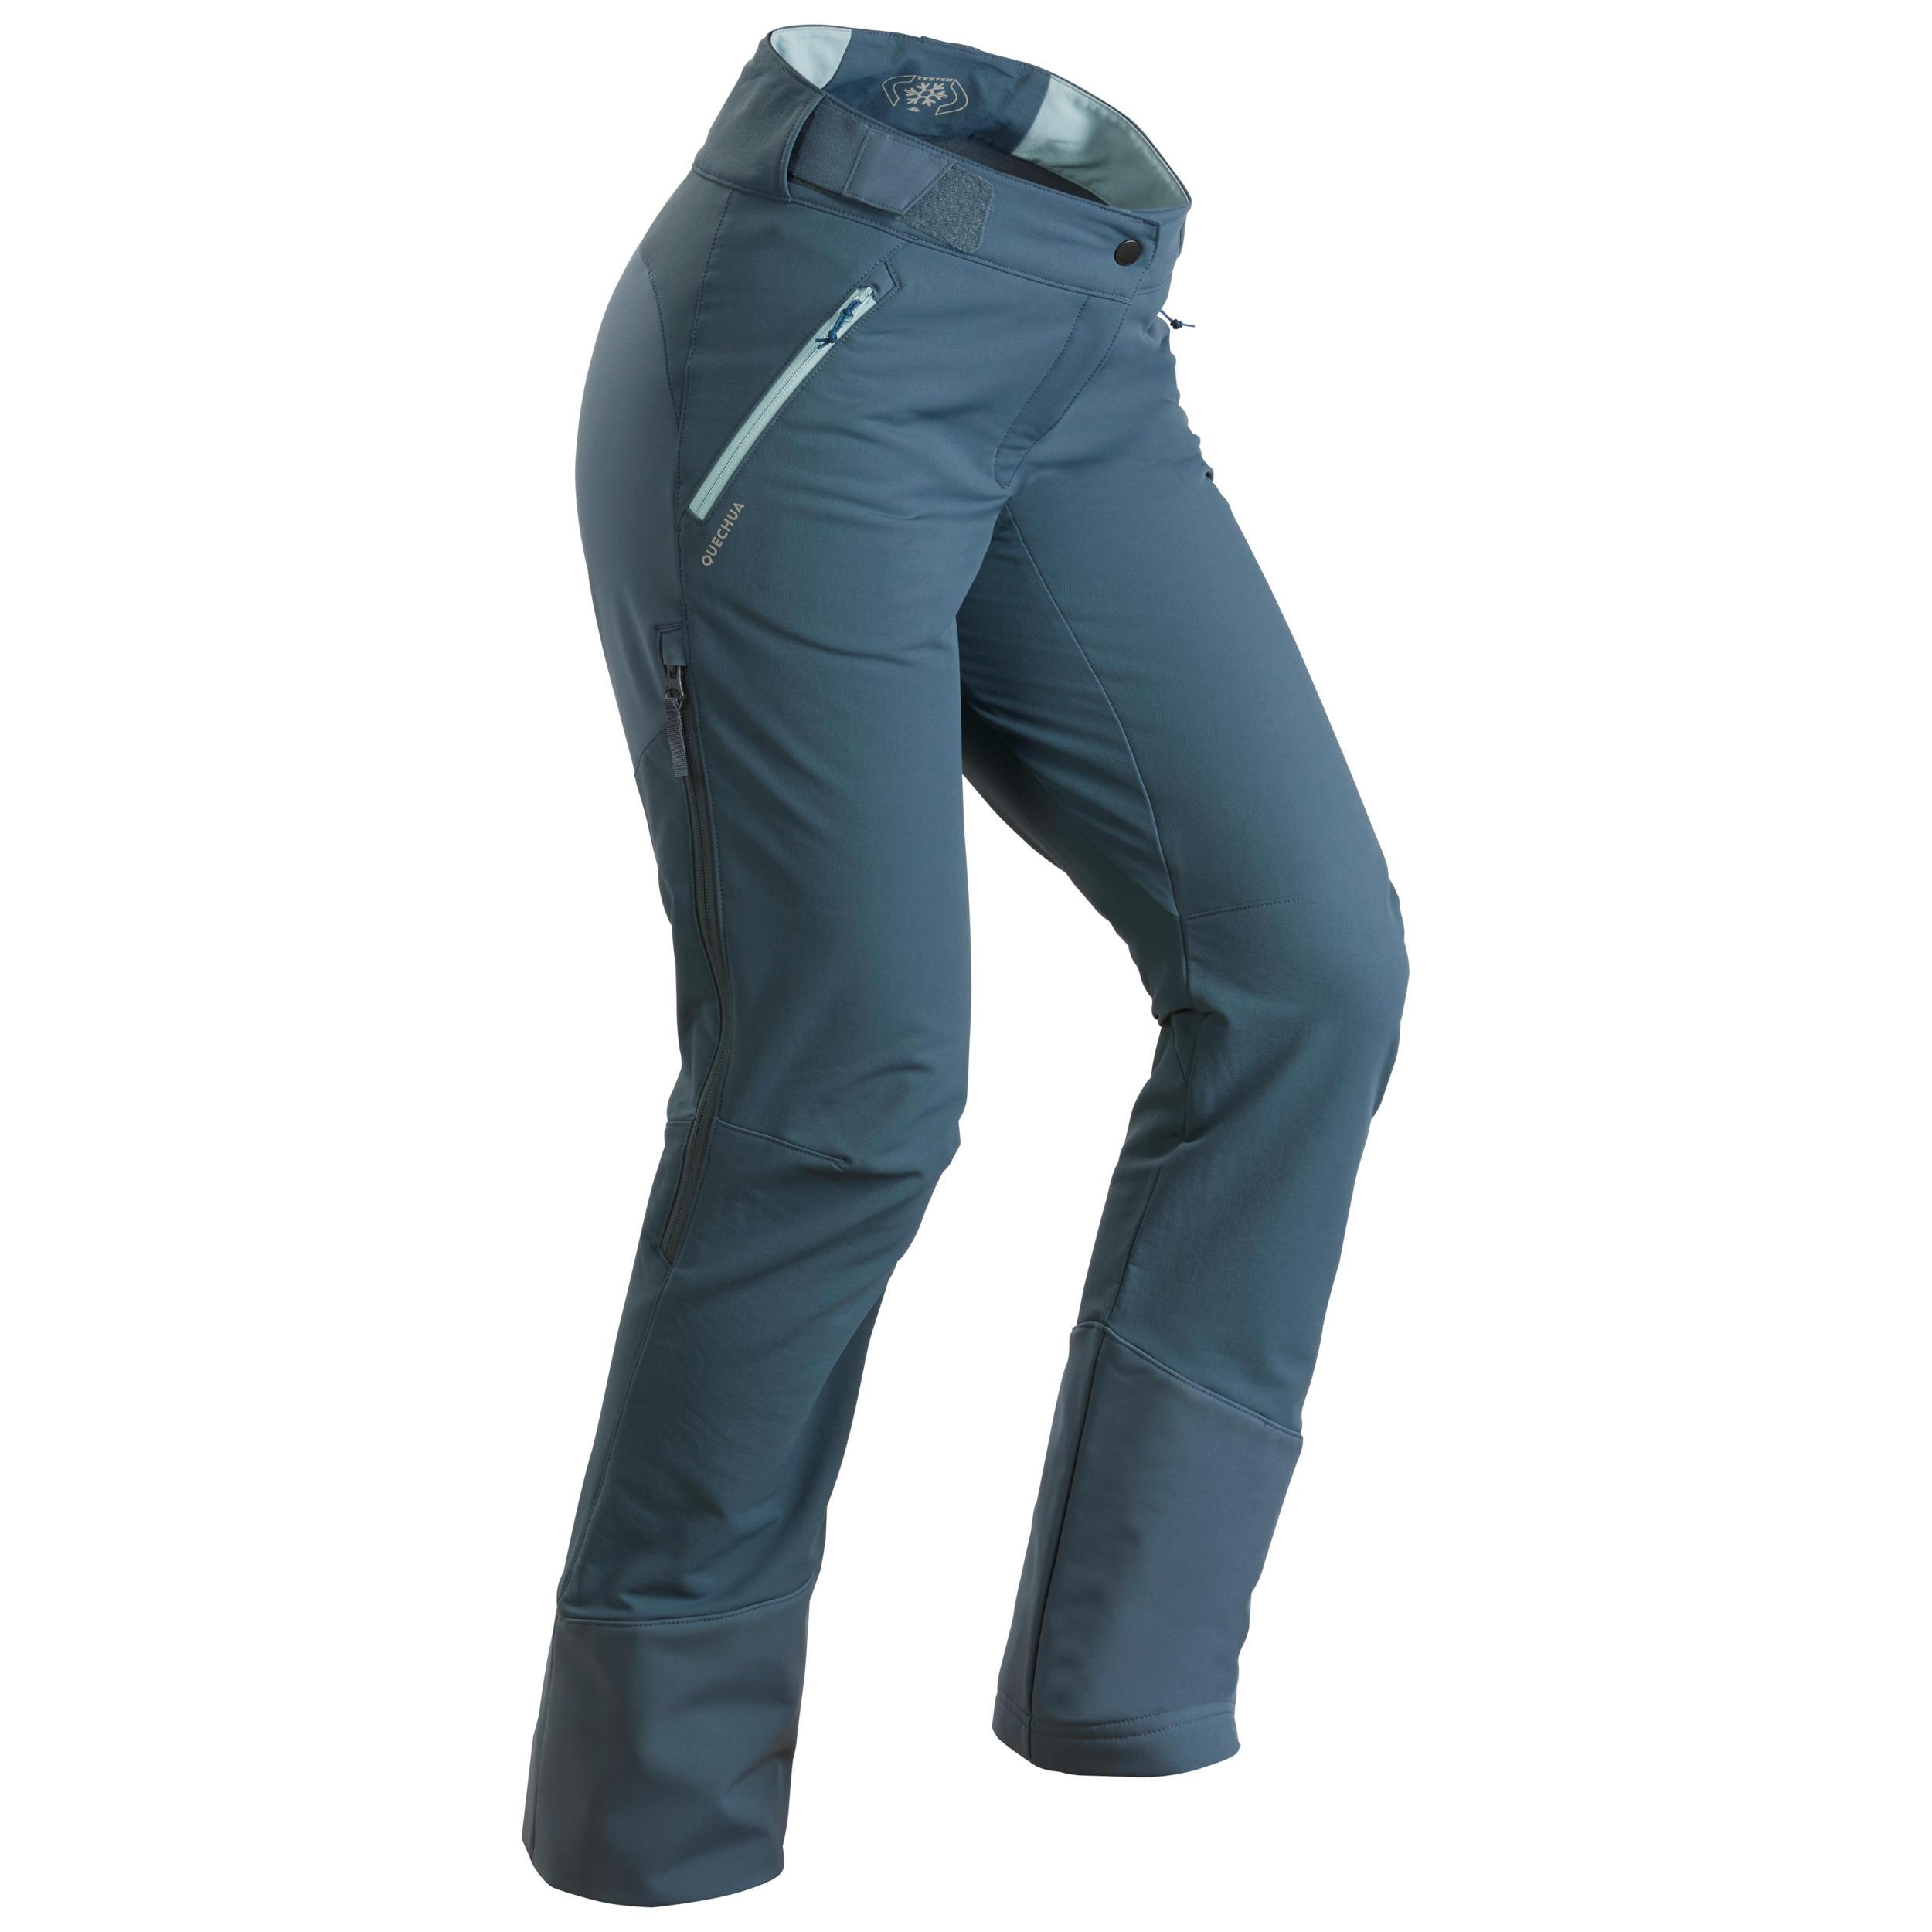 Pantalon SH520 Gri Damă imagine